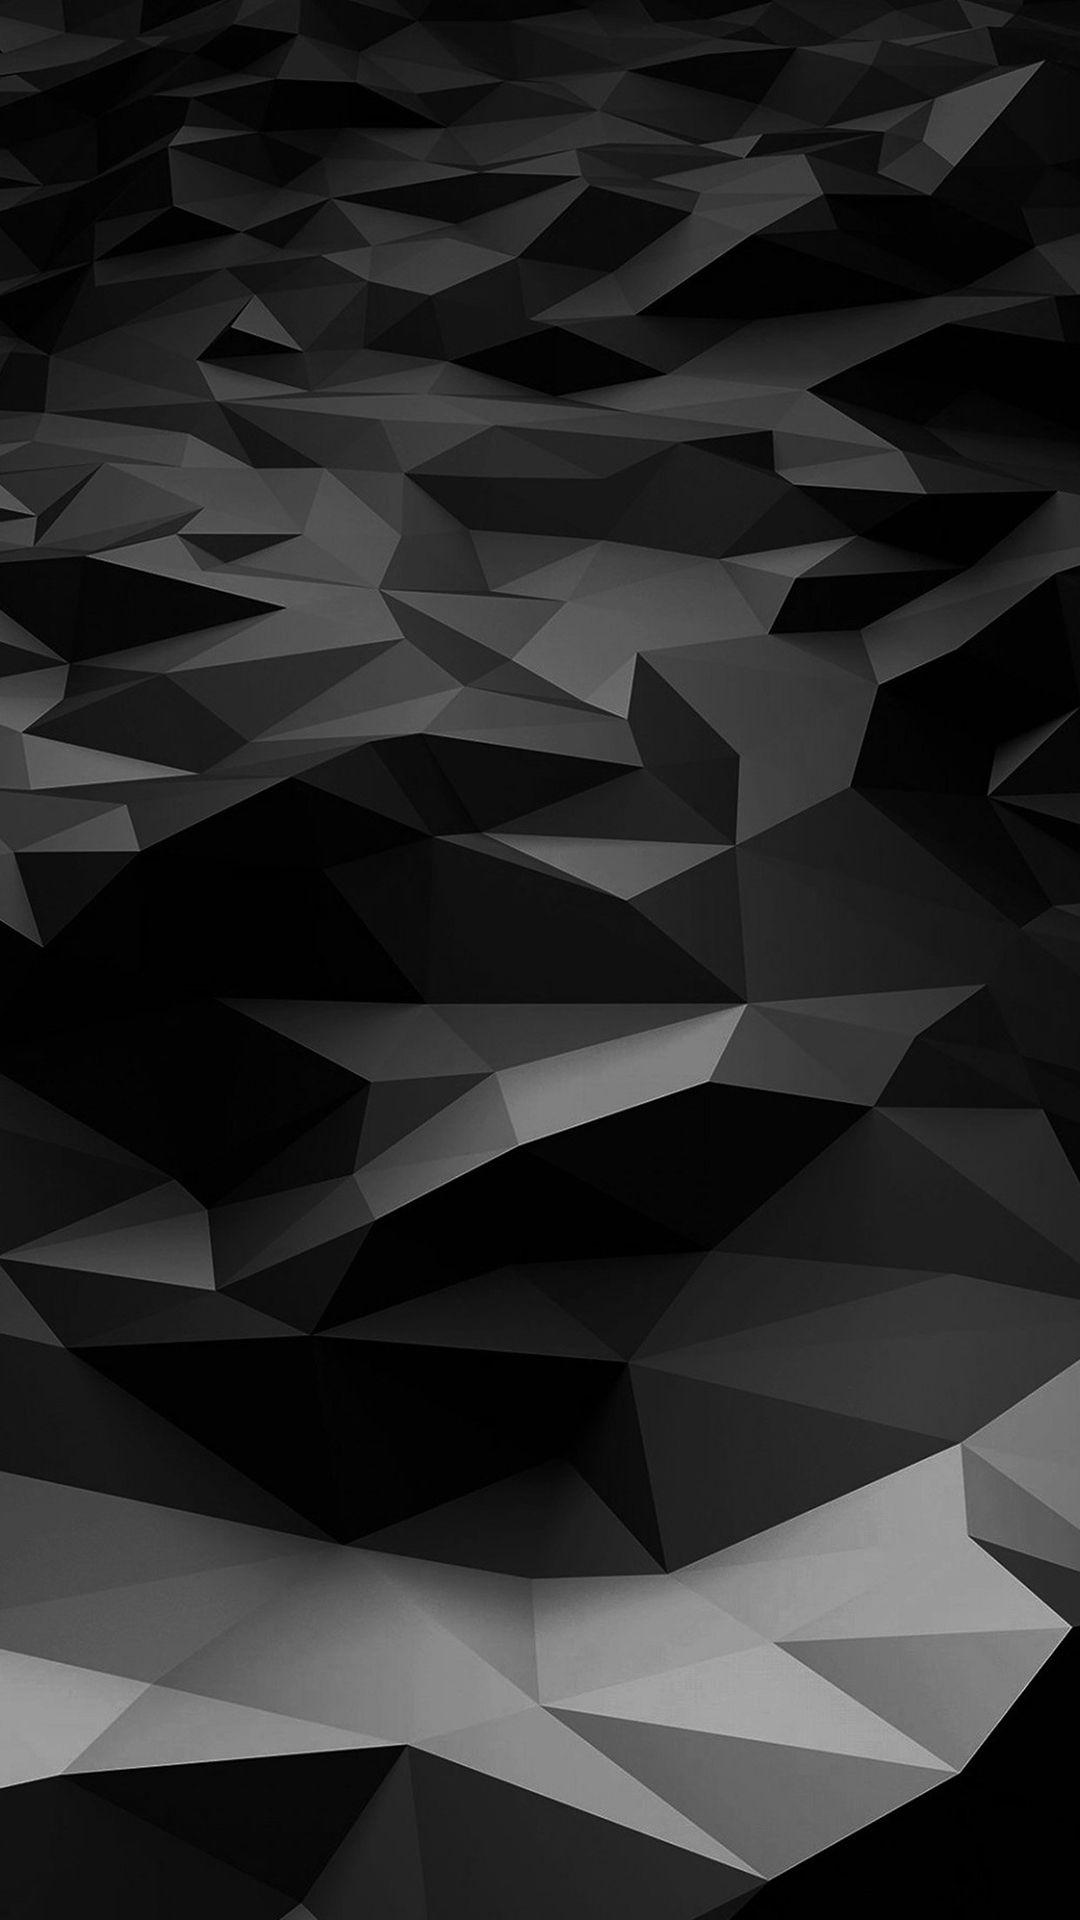 Black Wallpaper Iphone Tumblr Hd Clipartsgram For Stylish Tumblr